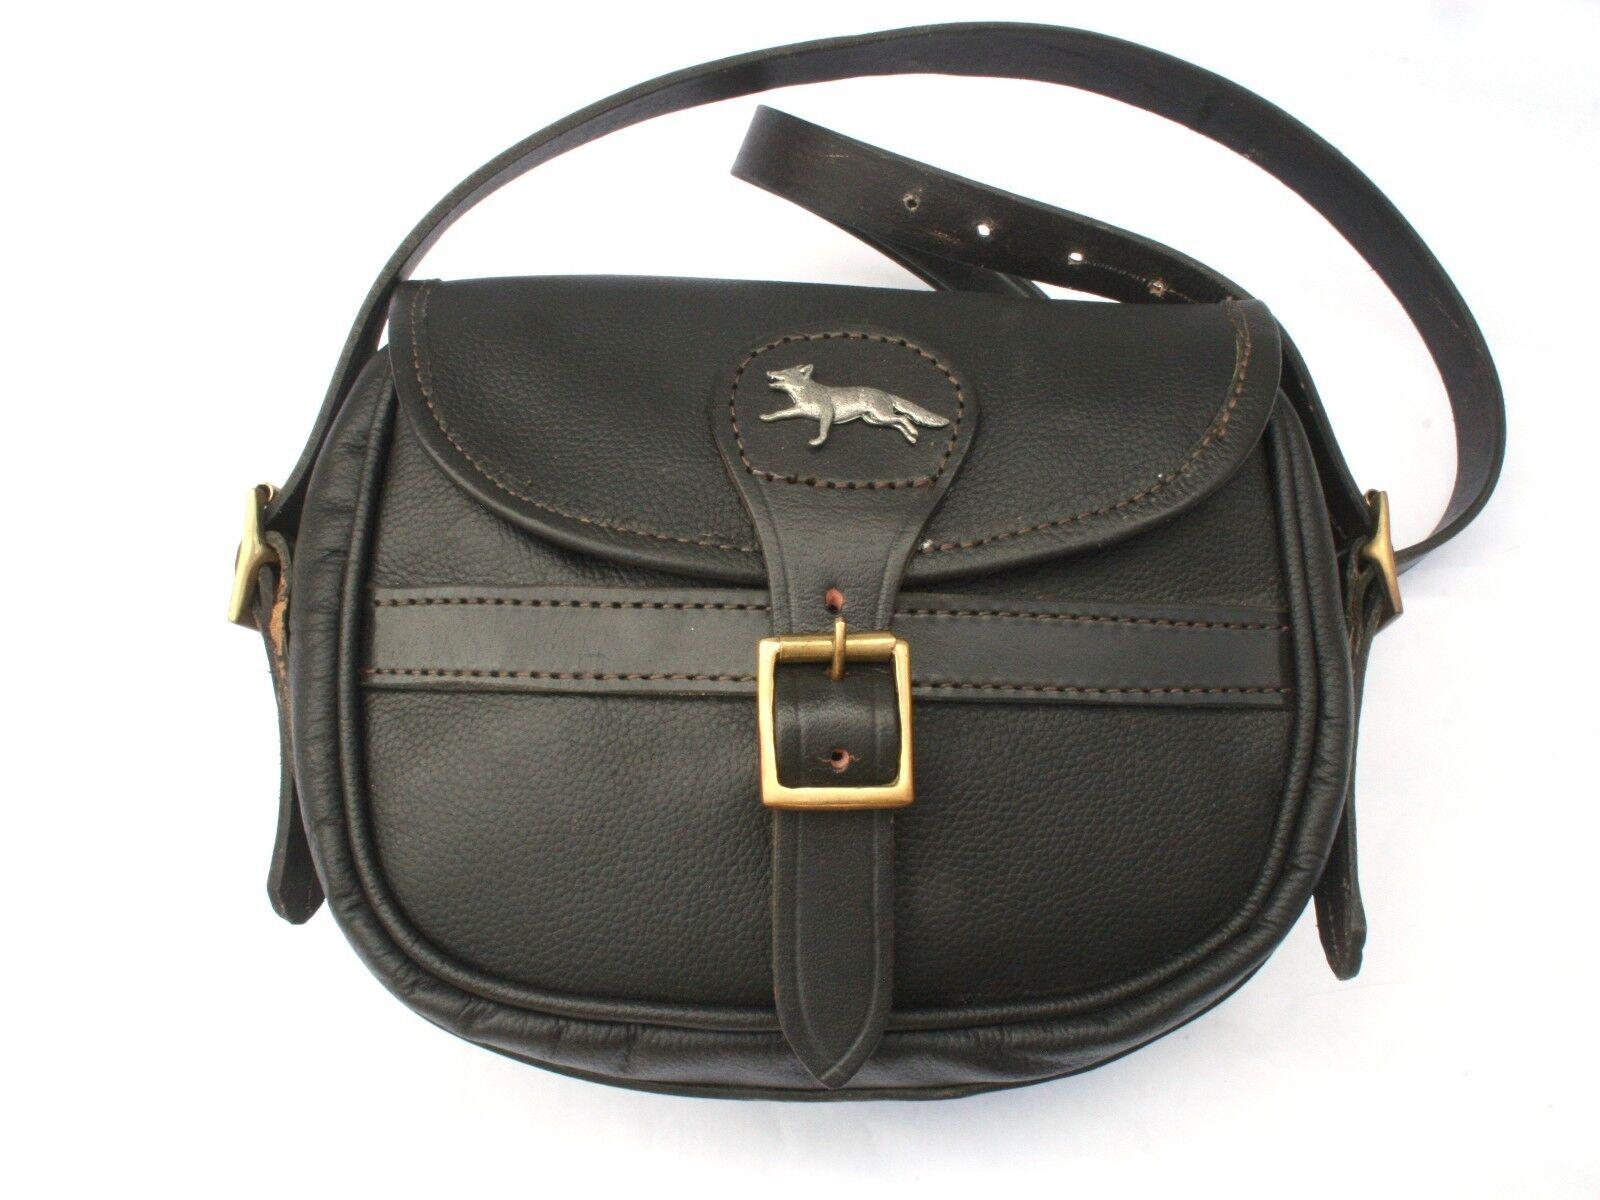 Fox Running Leather Shooting Cartridge Bag 75 Capacity Game Shooting Gift